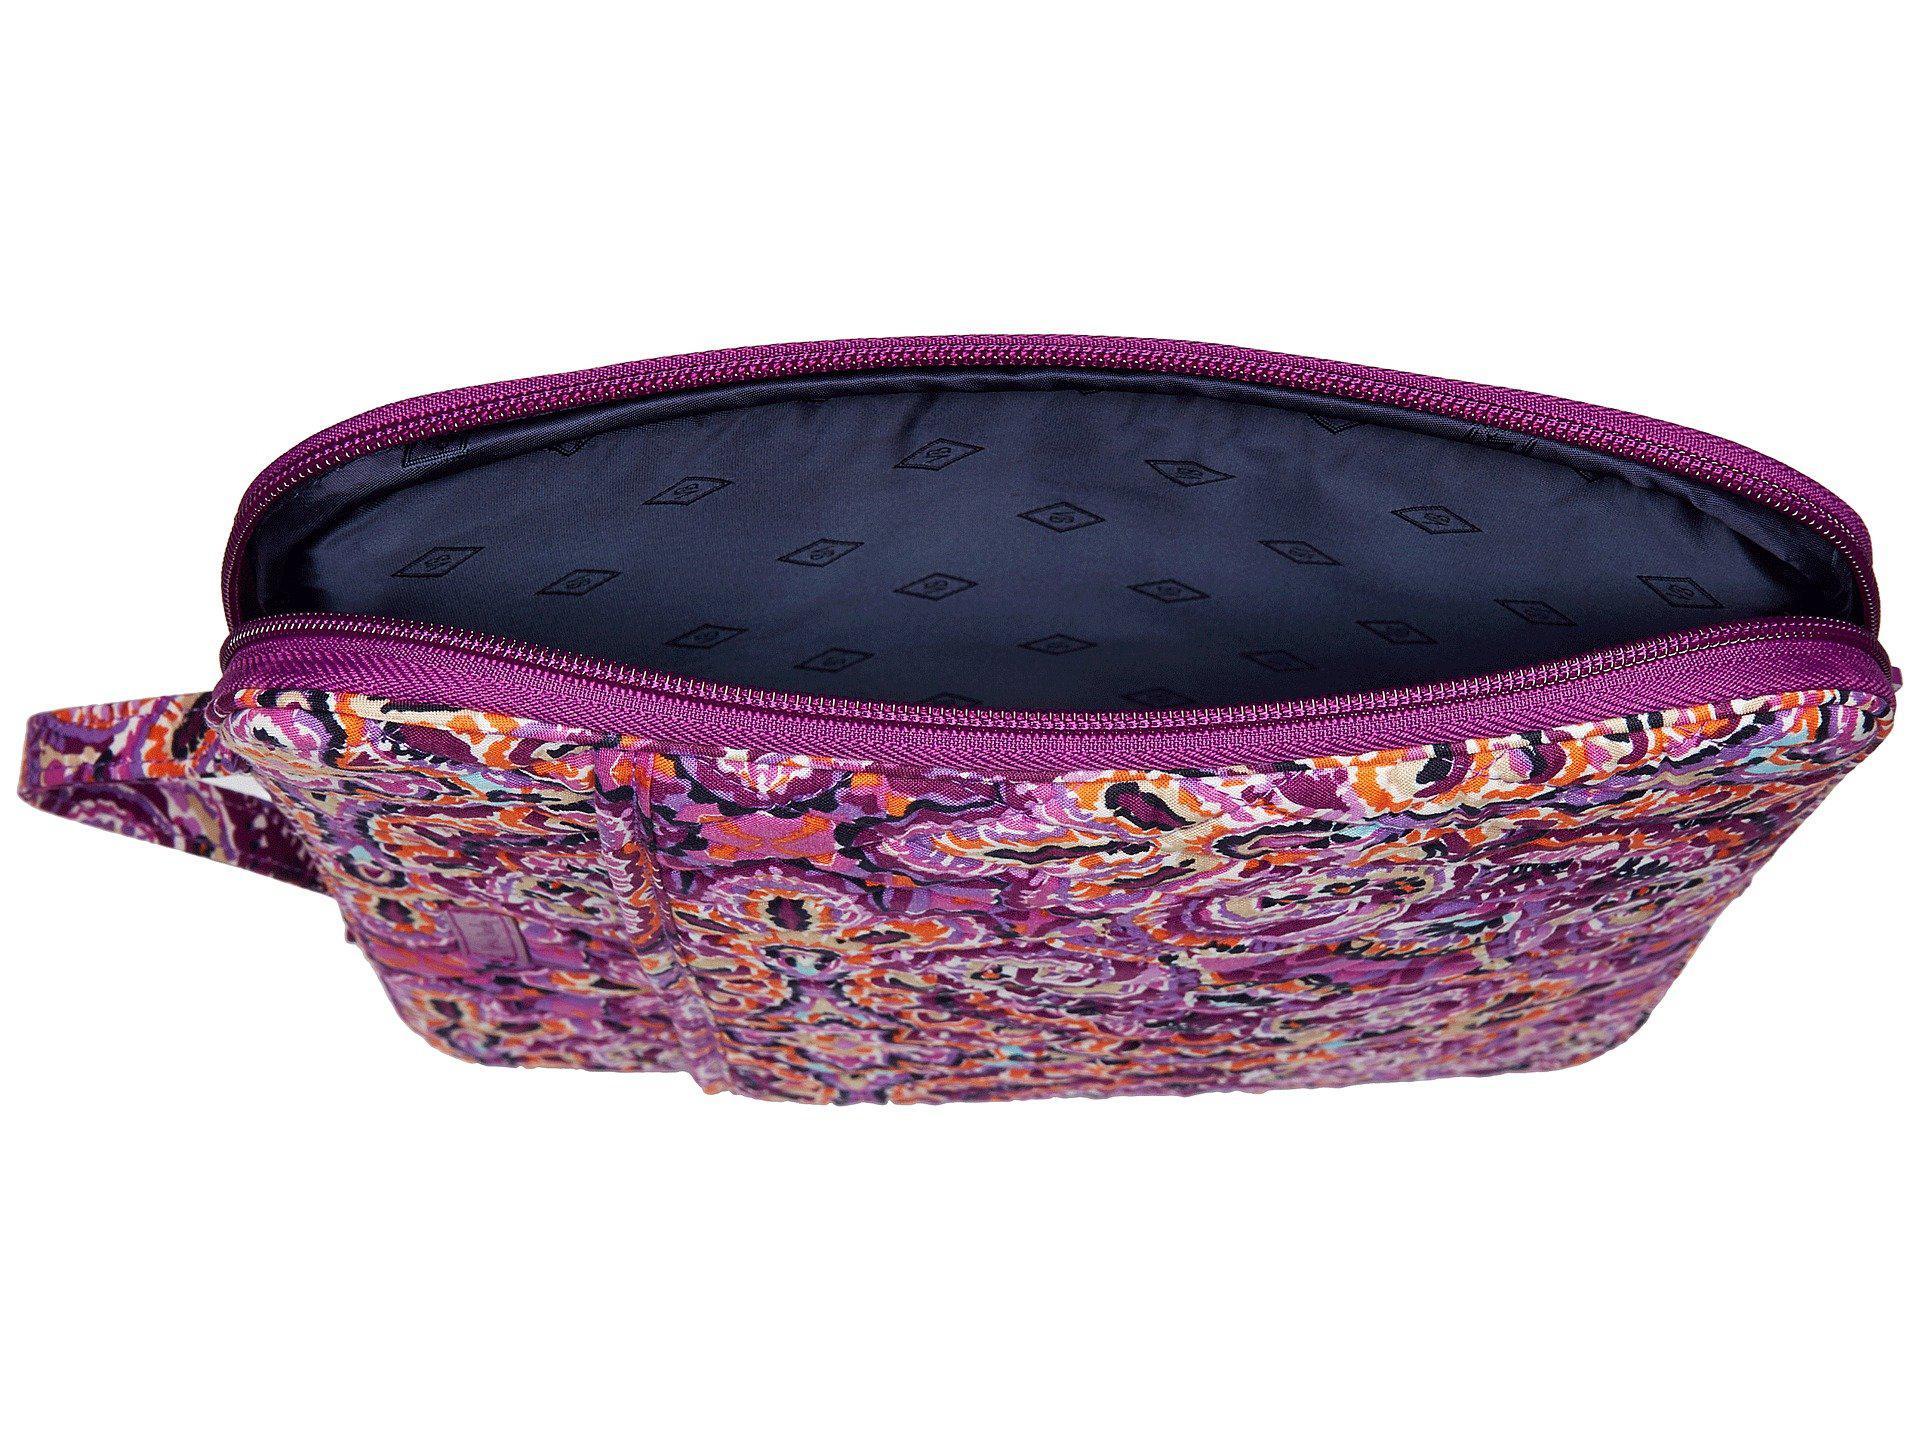 Vera Bradley Laptop Organizer Dream Tapestry Briefcase